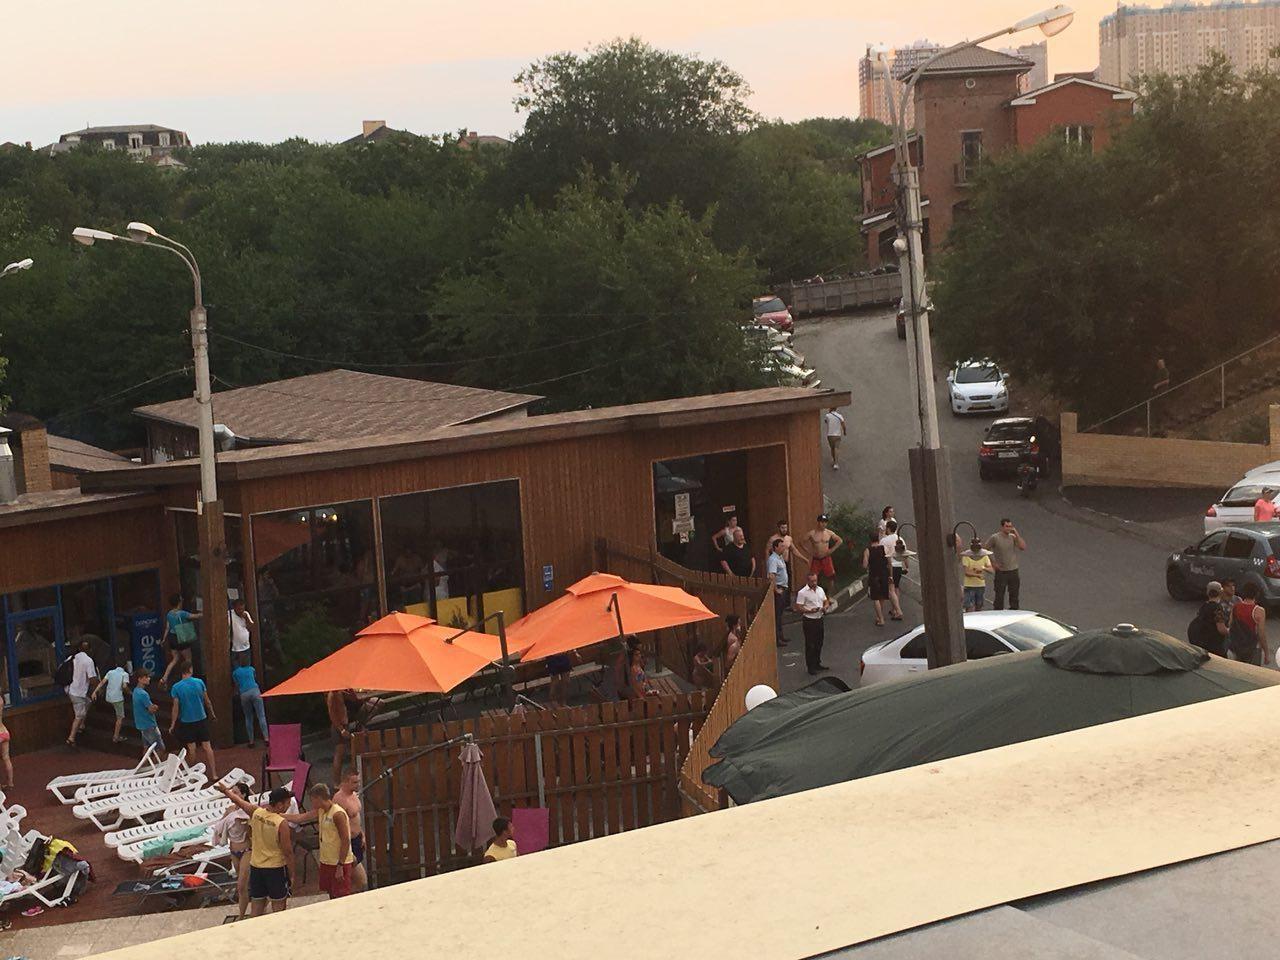 Вростовском аквапарке произошла драка сучастием 30 человек